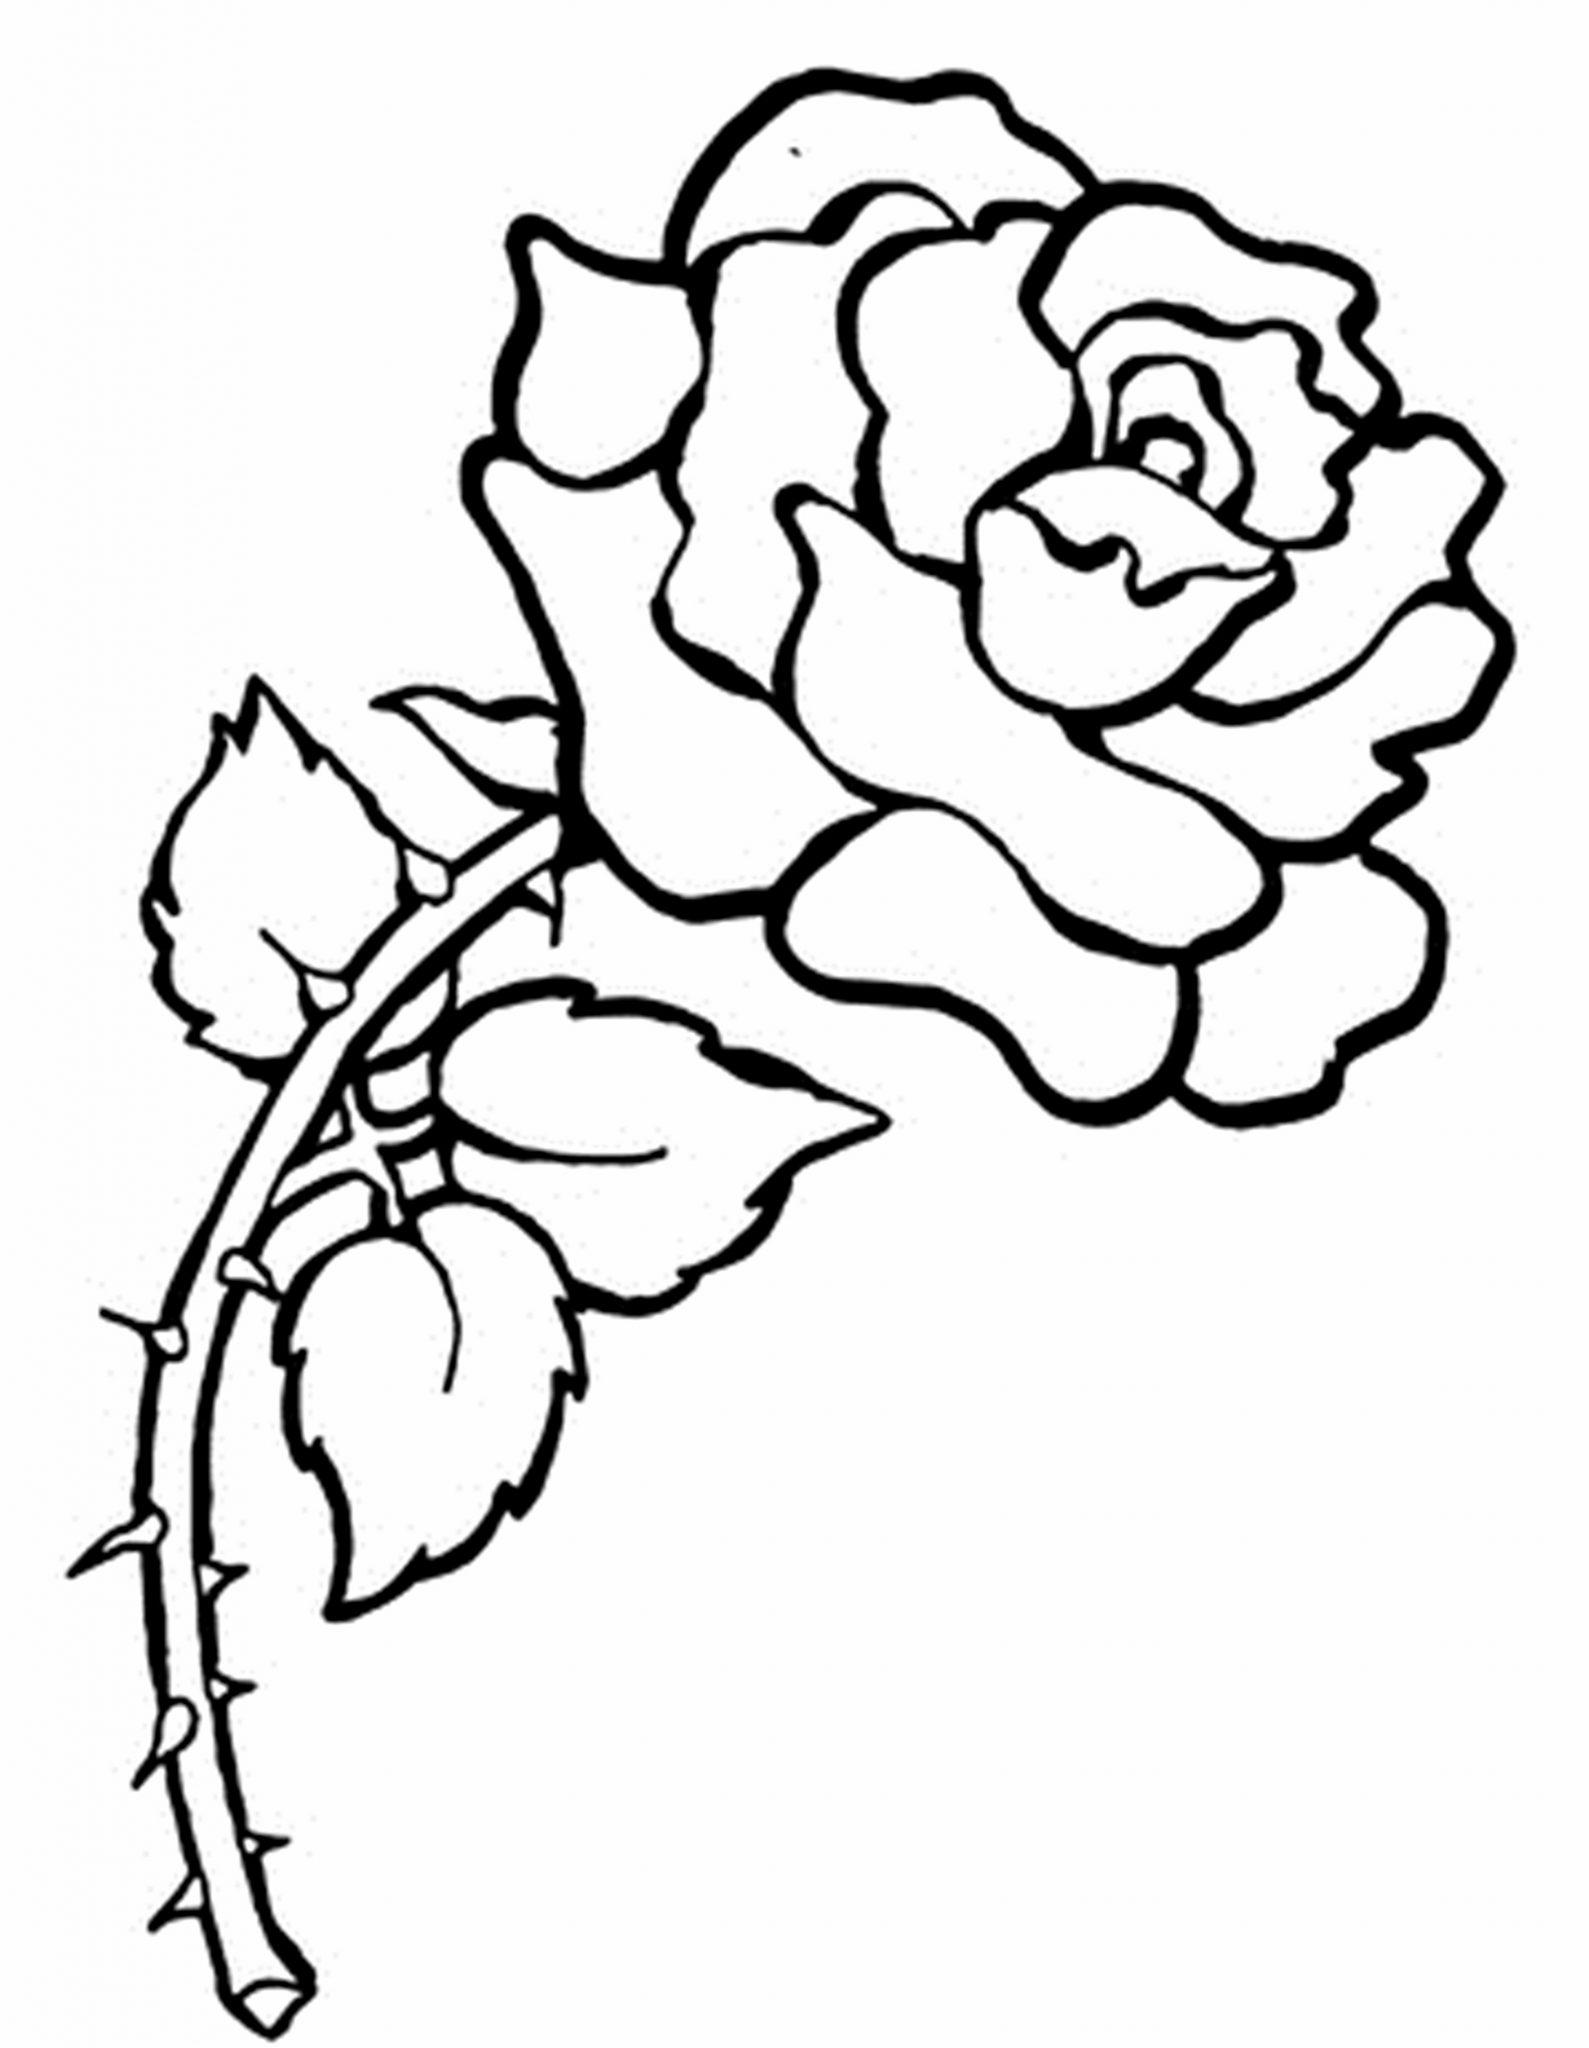 Contoh Gambar Mewarnai Gambar Bunga Ros Kataucap